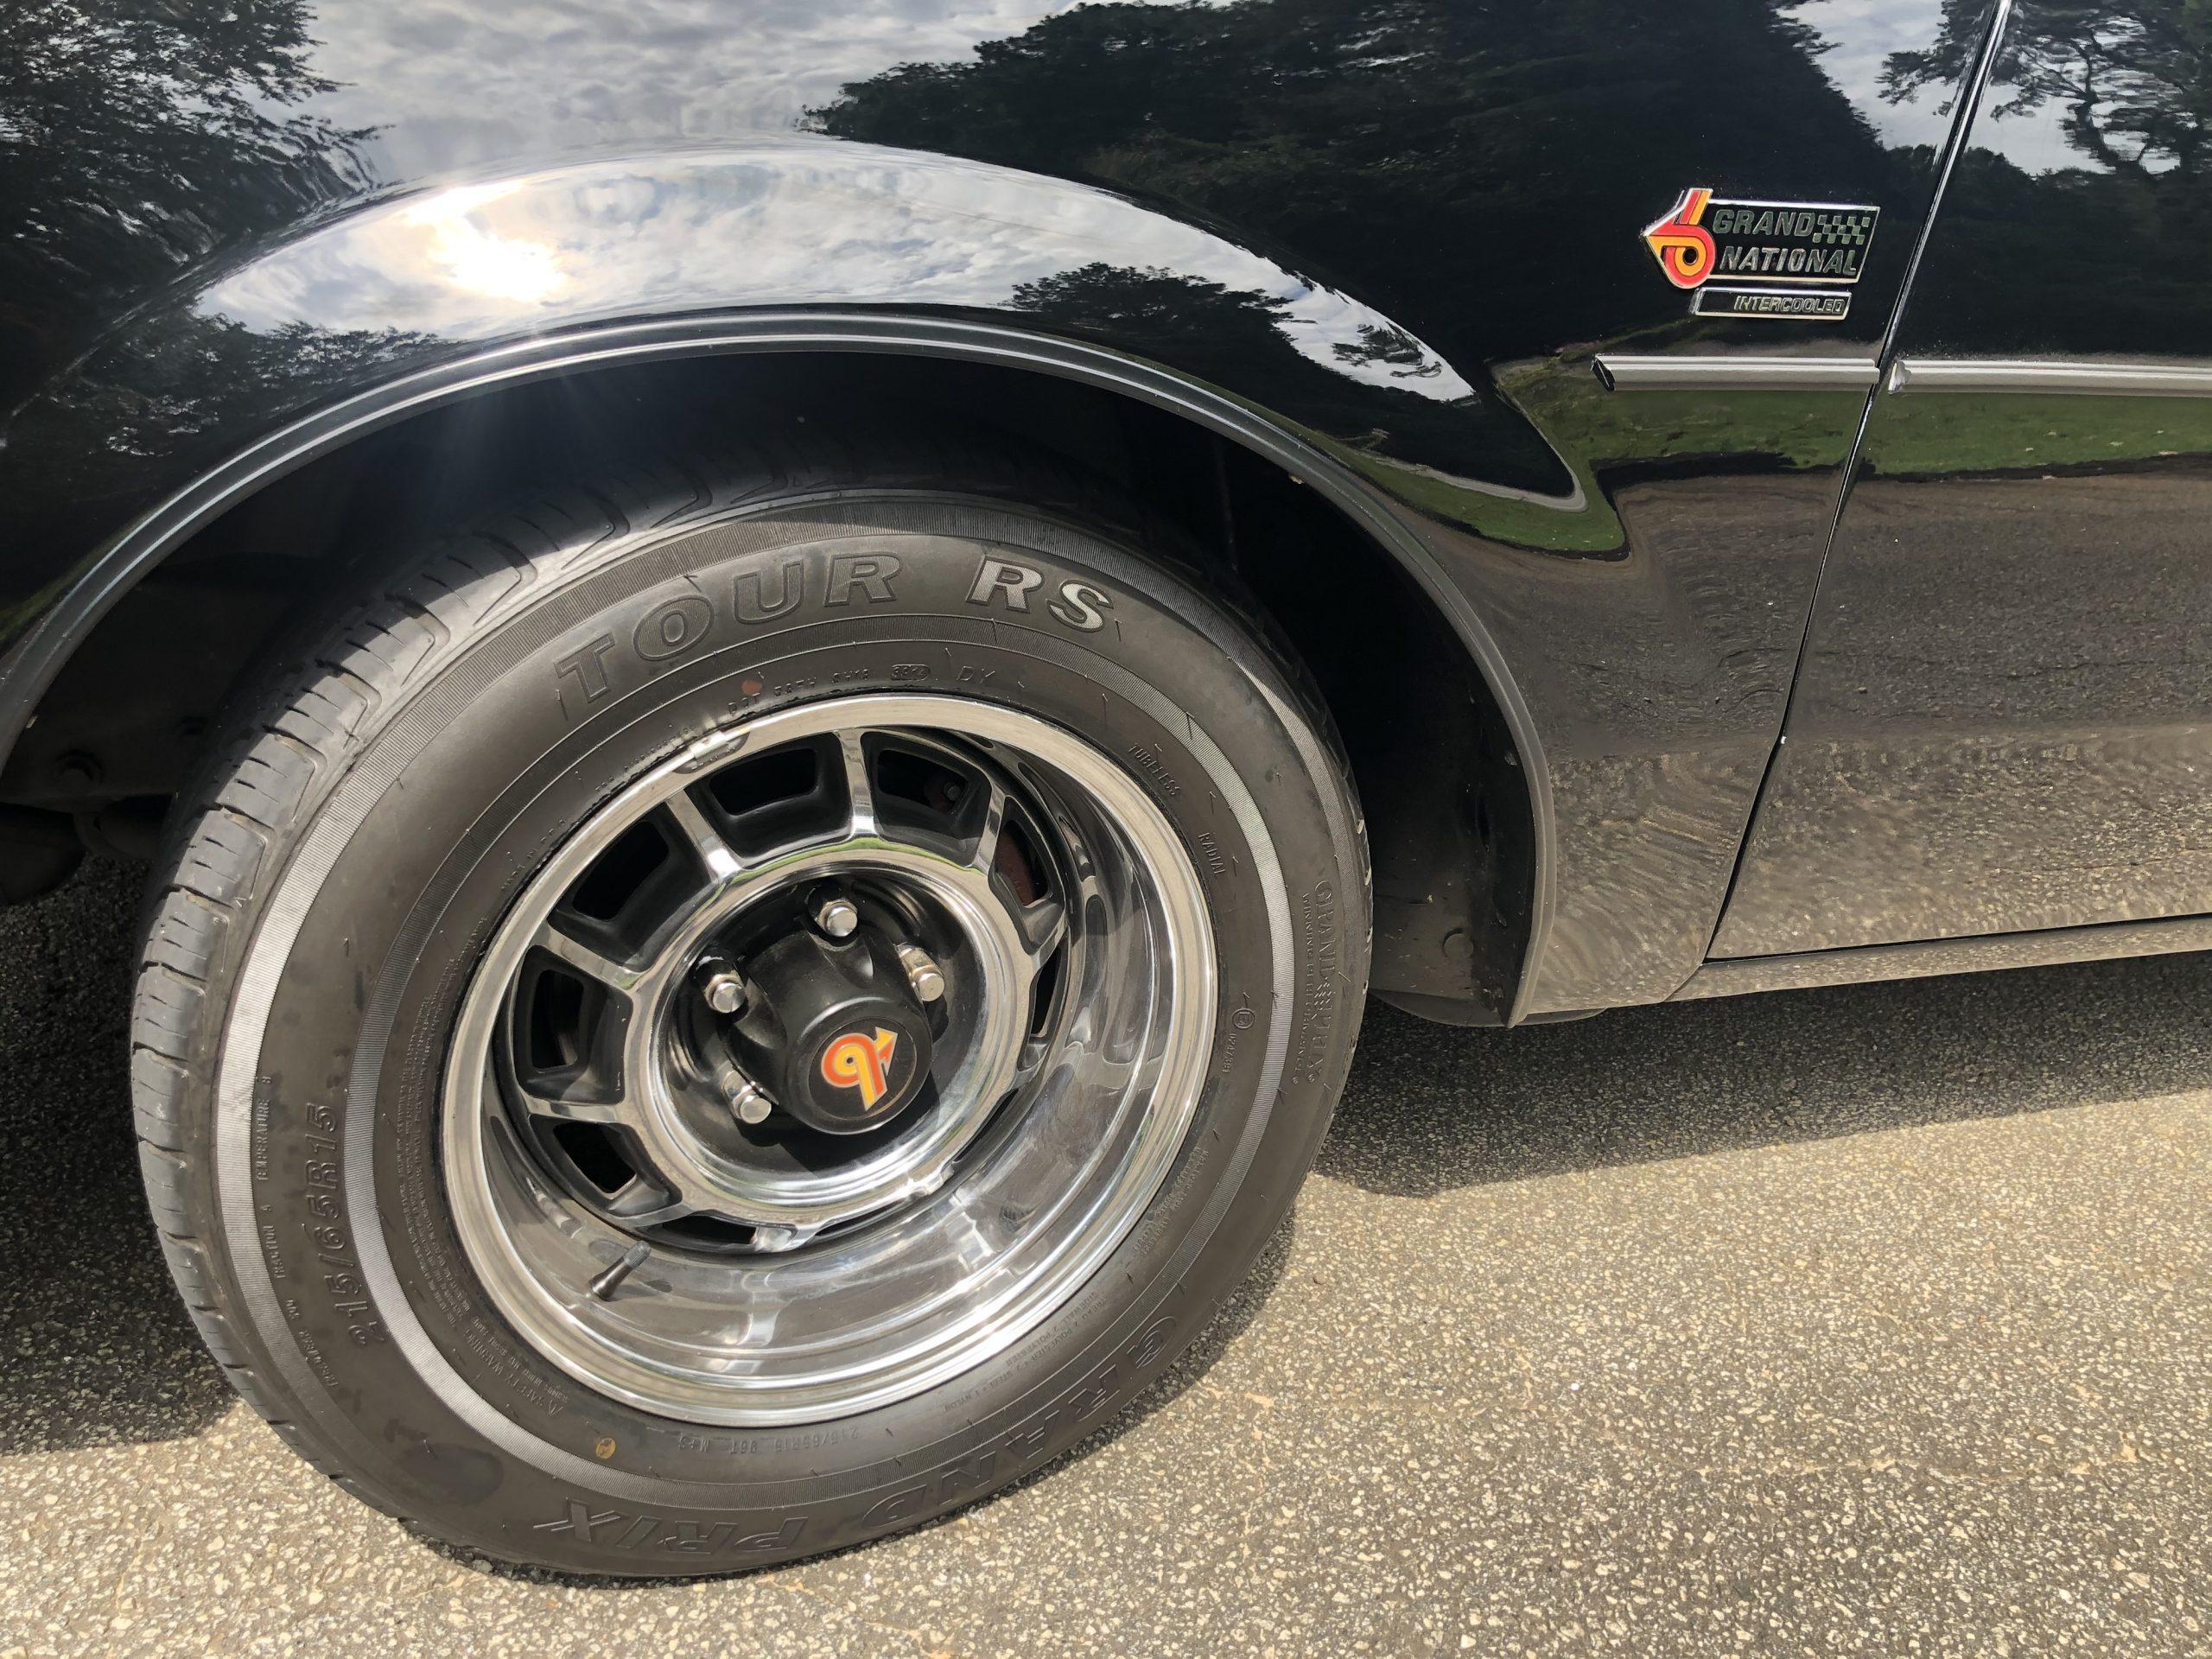 1987 Buick Grand National wheel tire